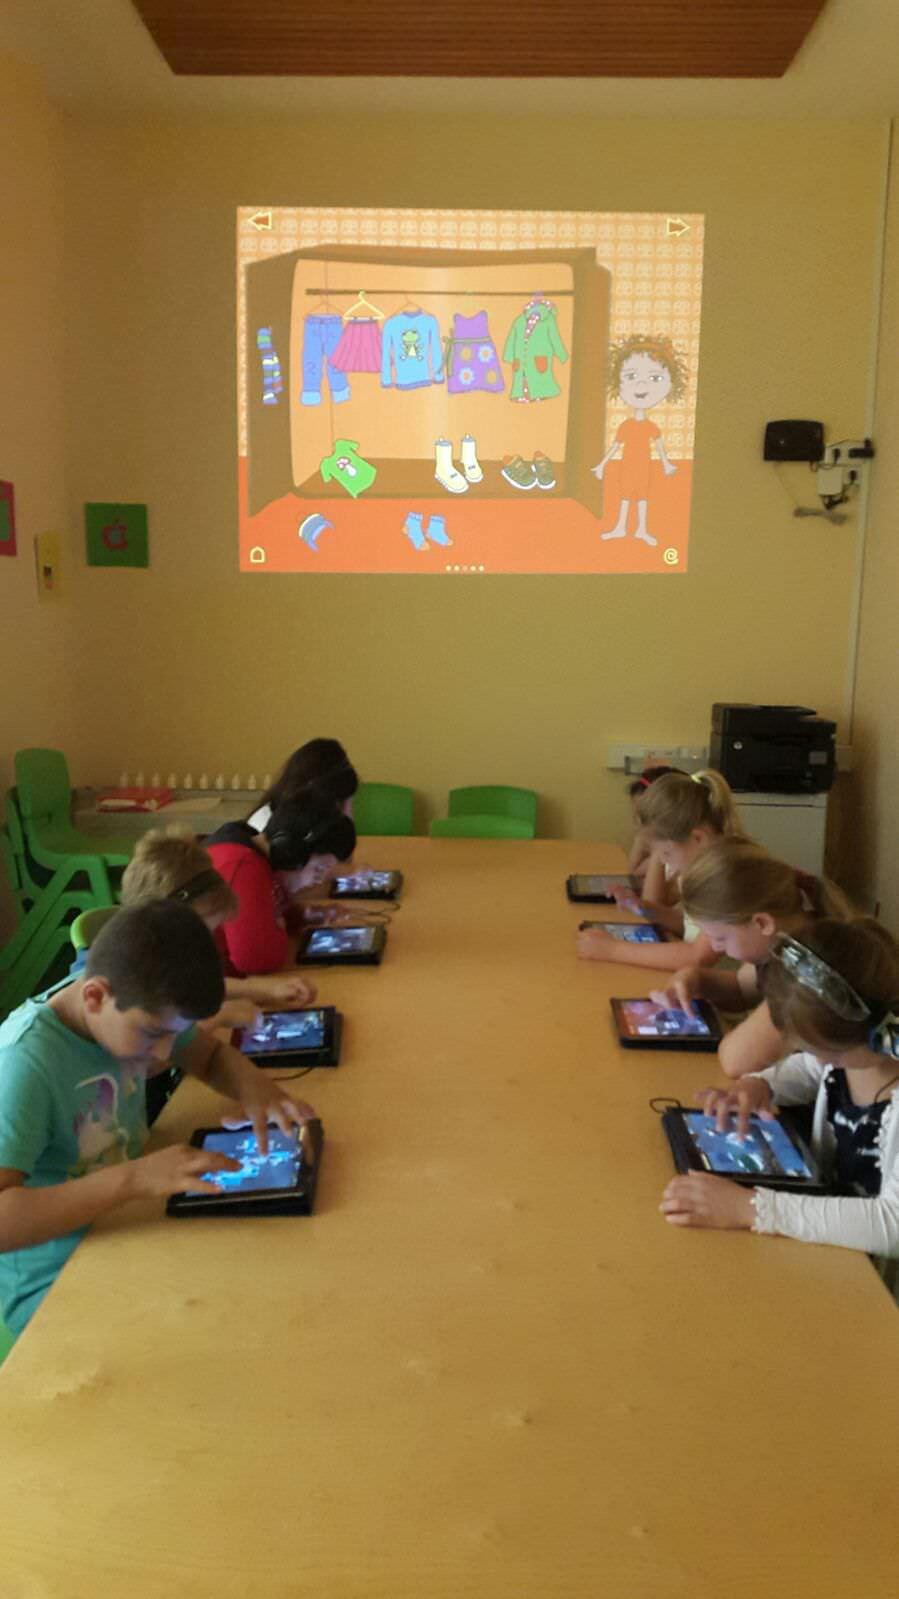 Kinder mit iPads